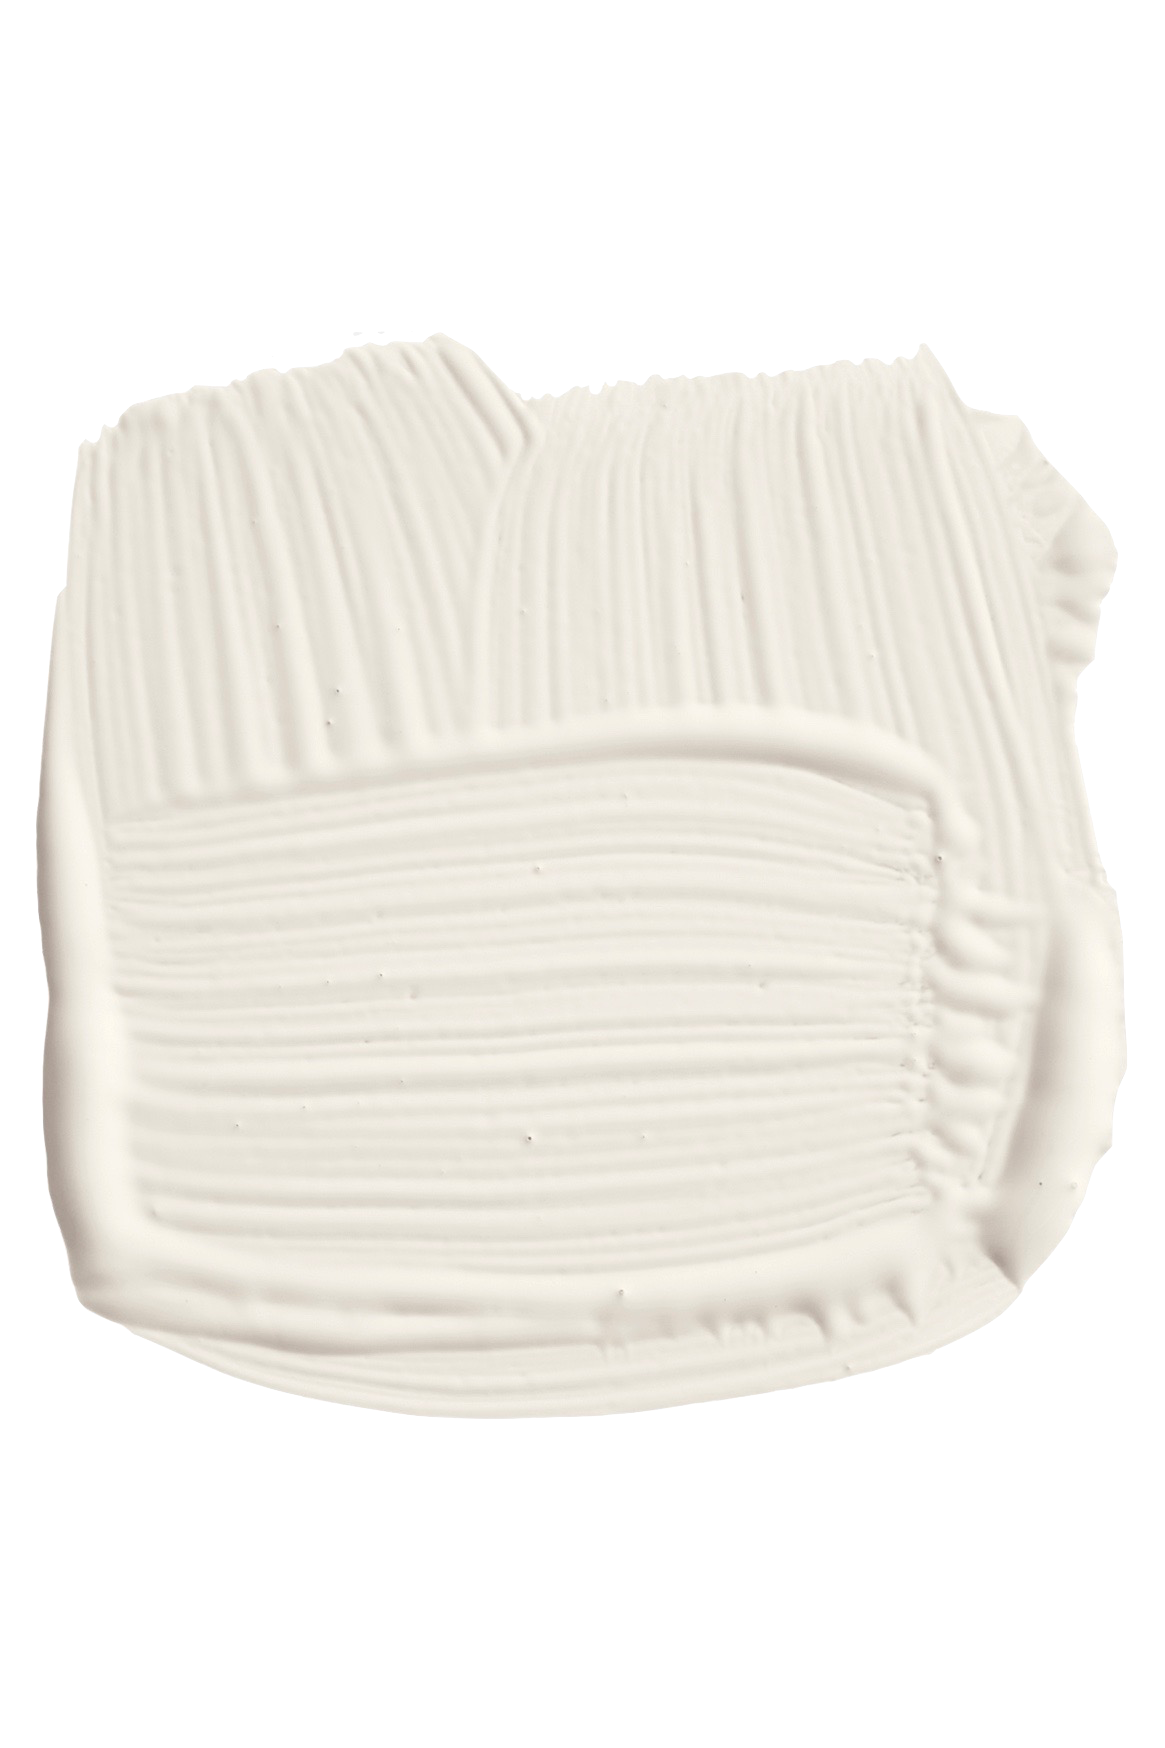 Wimborne White Nr. 239 ®